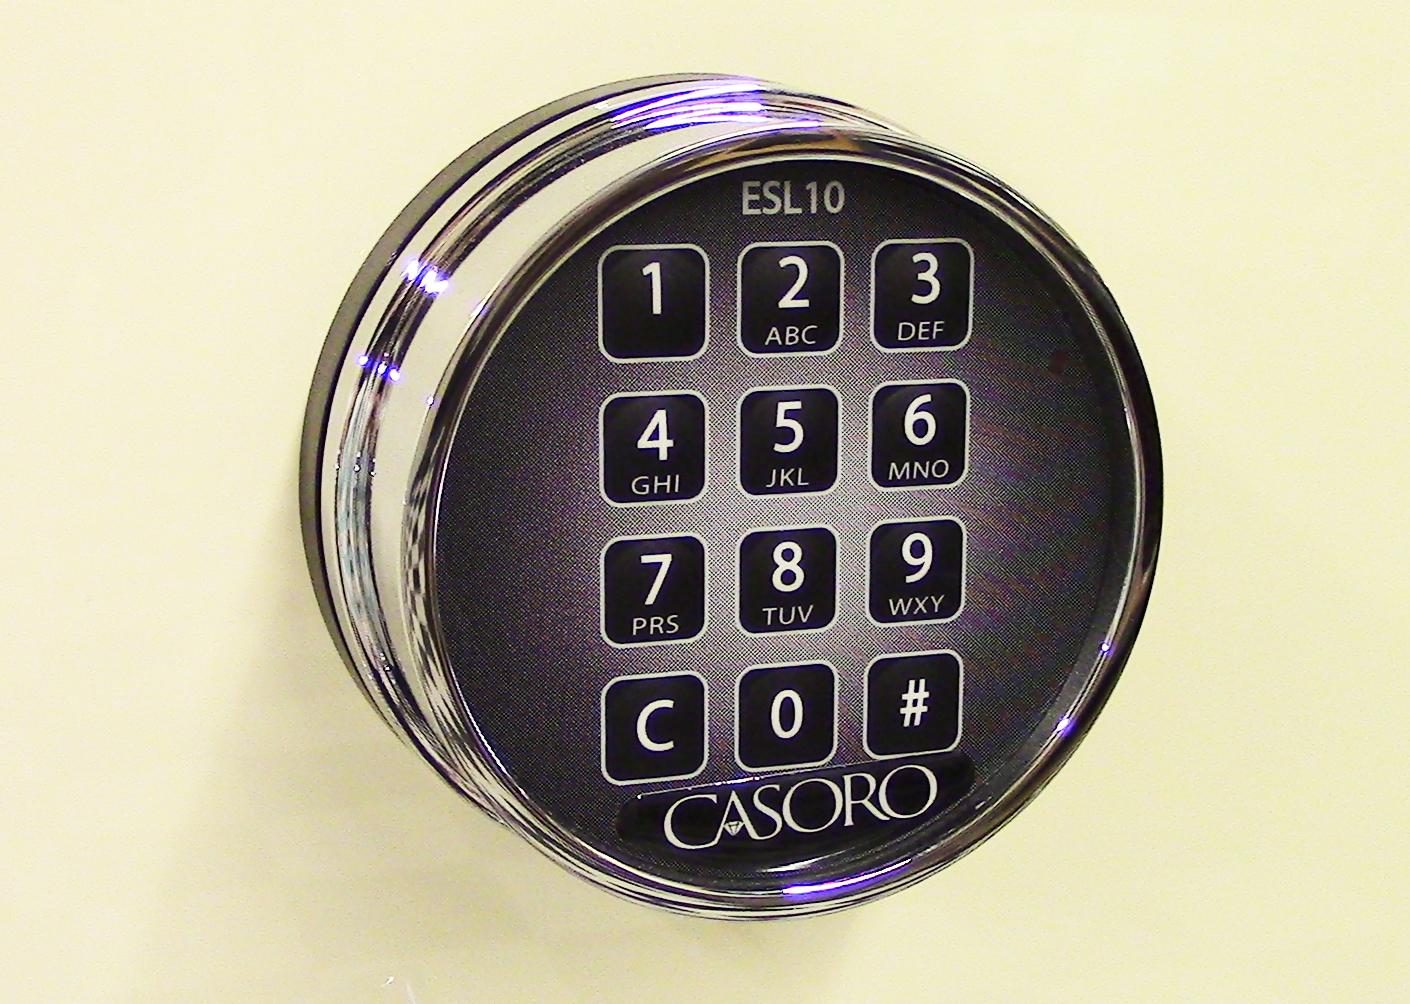 casoro keypad lock